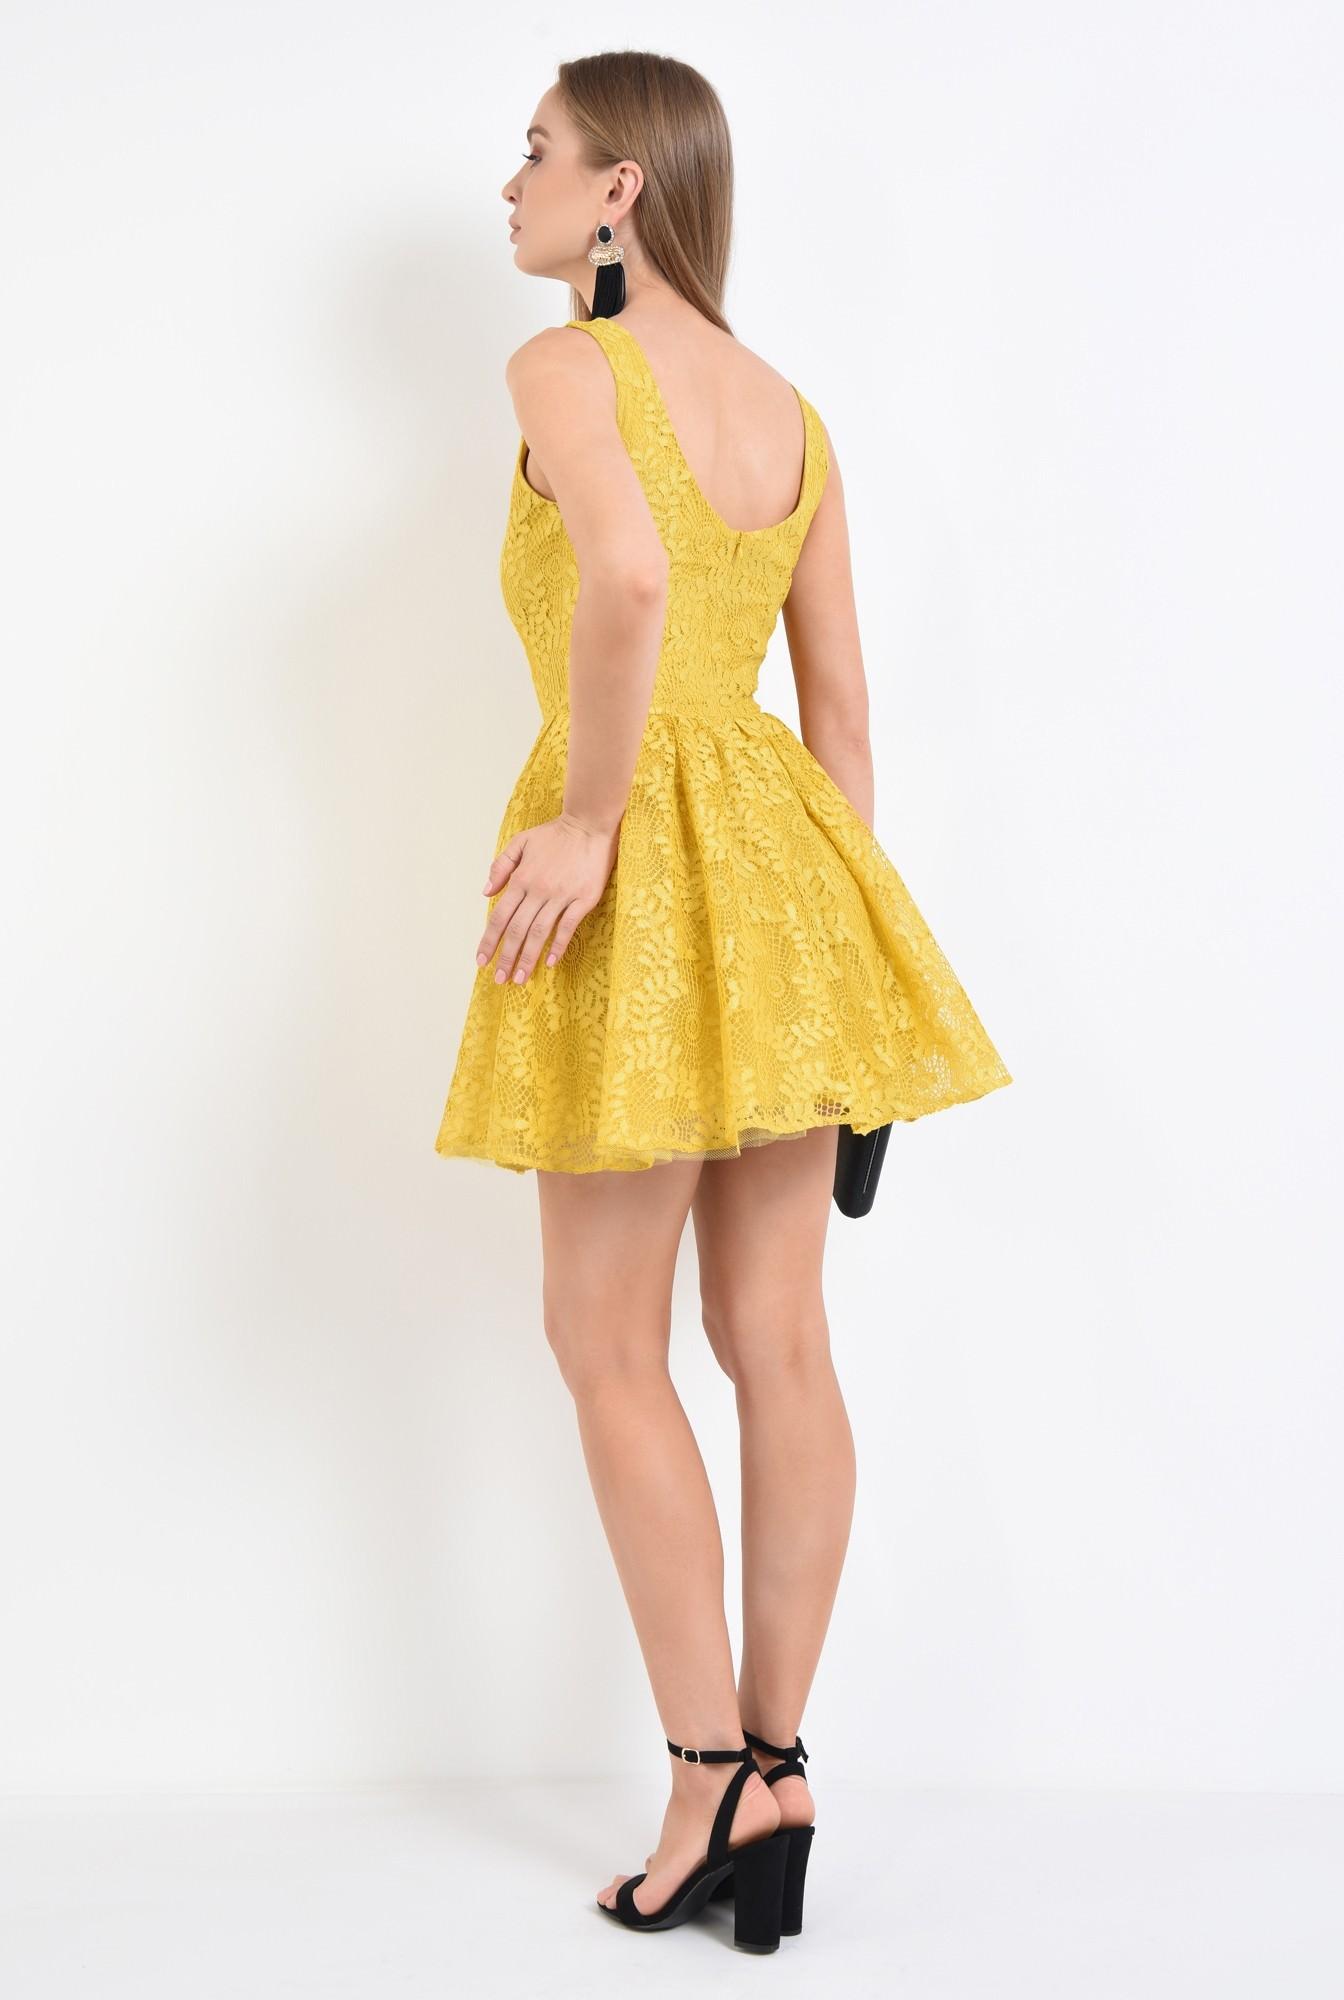 1 - 360 - rochie de seara, dantela galbena, cloche, rochii online